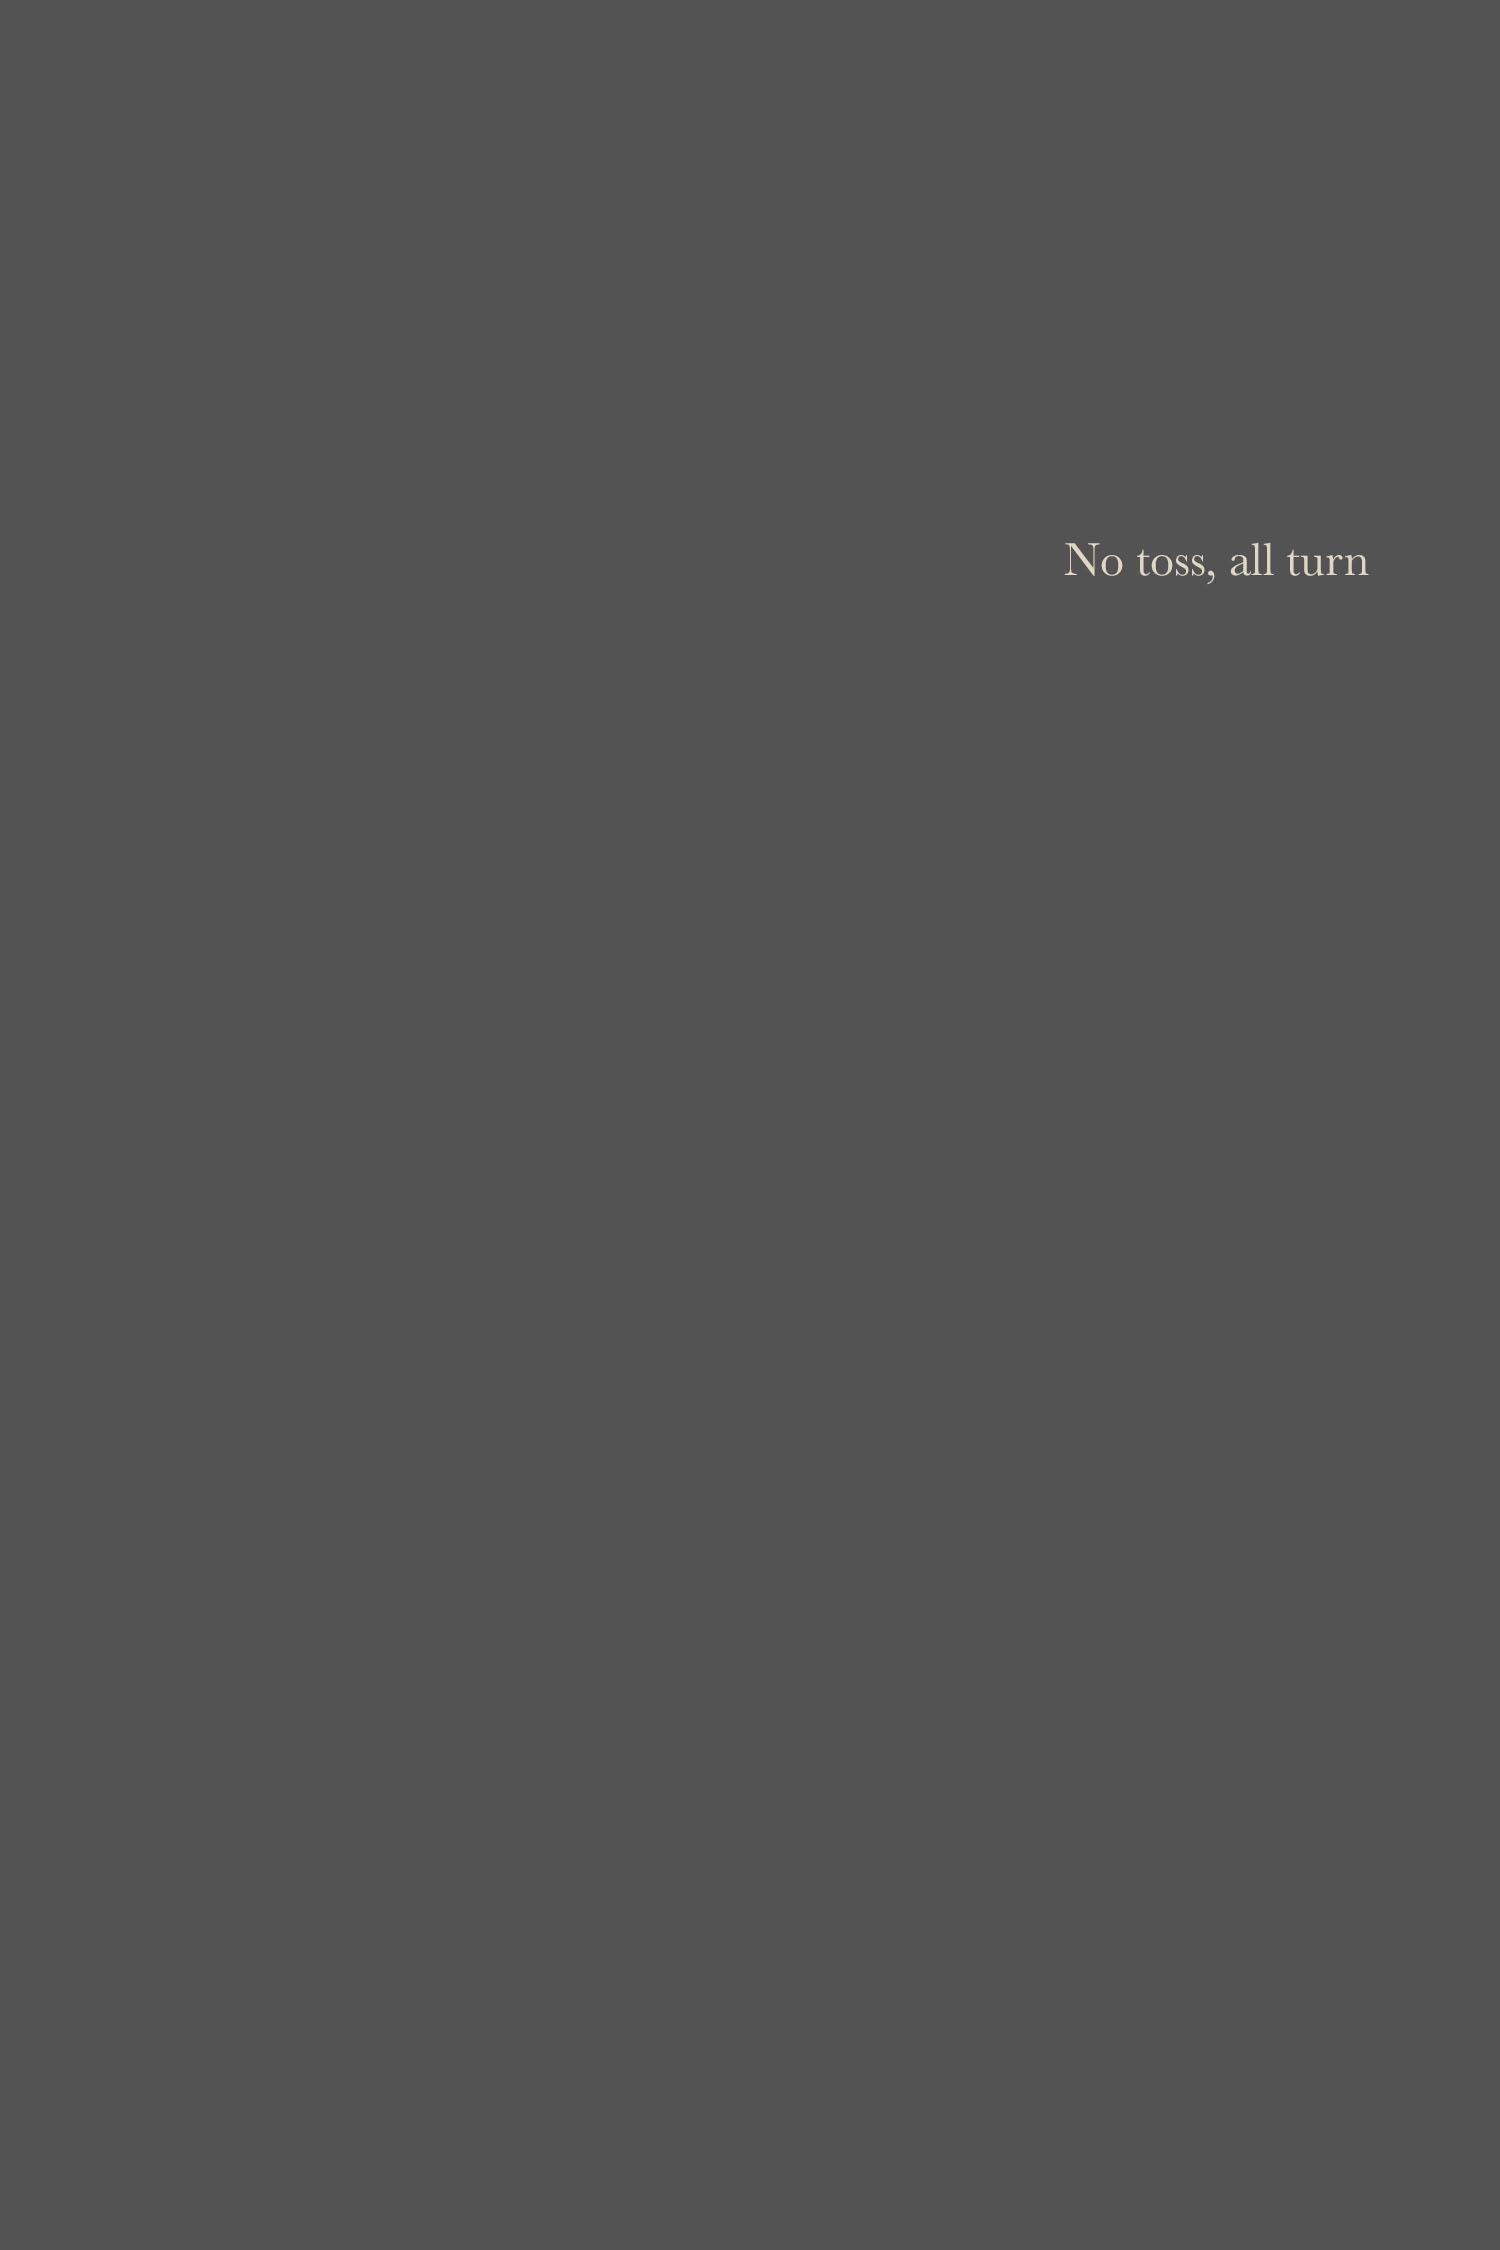 WISFH-notossallturn-title.jpg